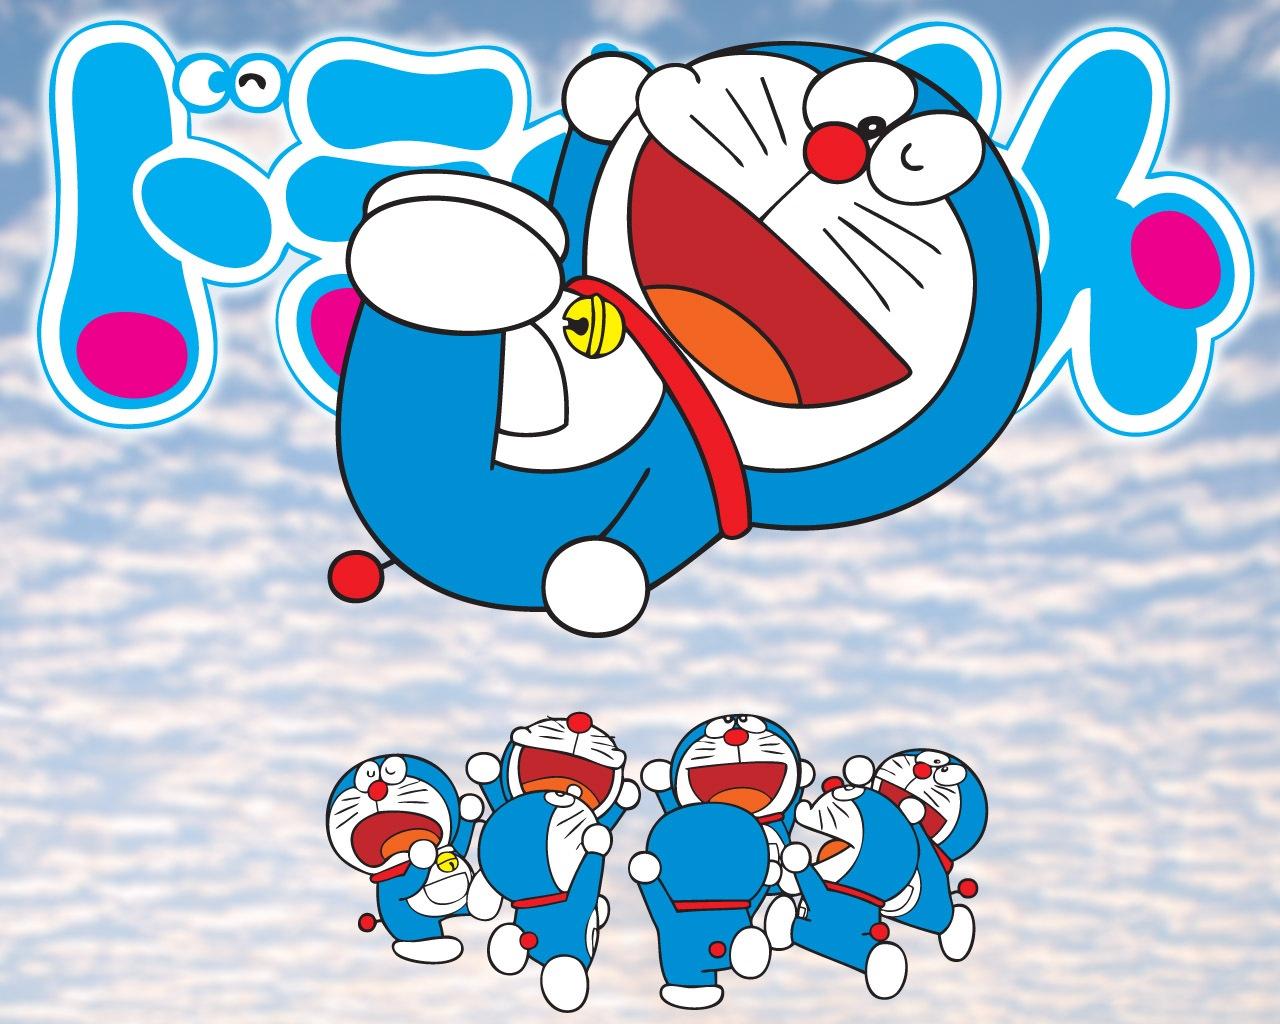 dealova.: Doraemon (ドラえもん)